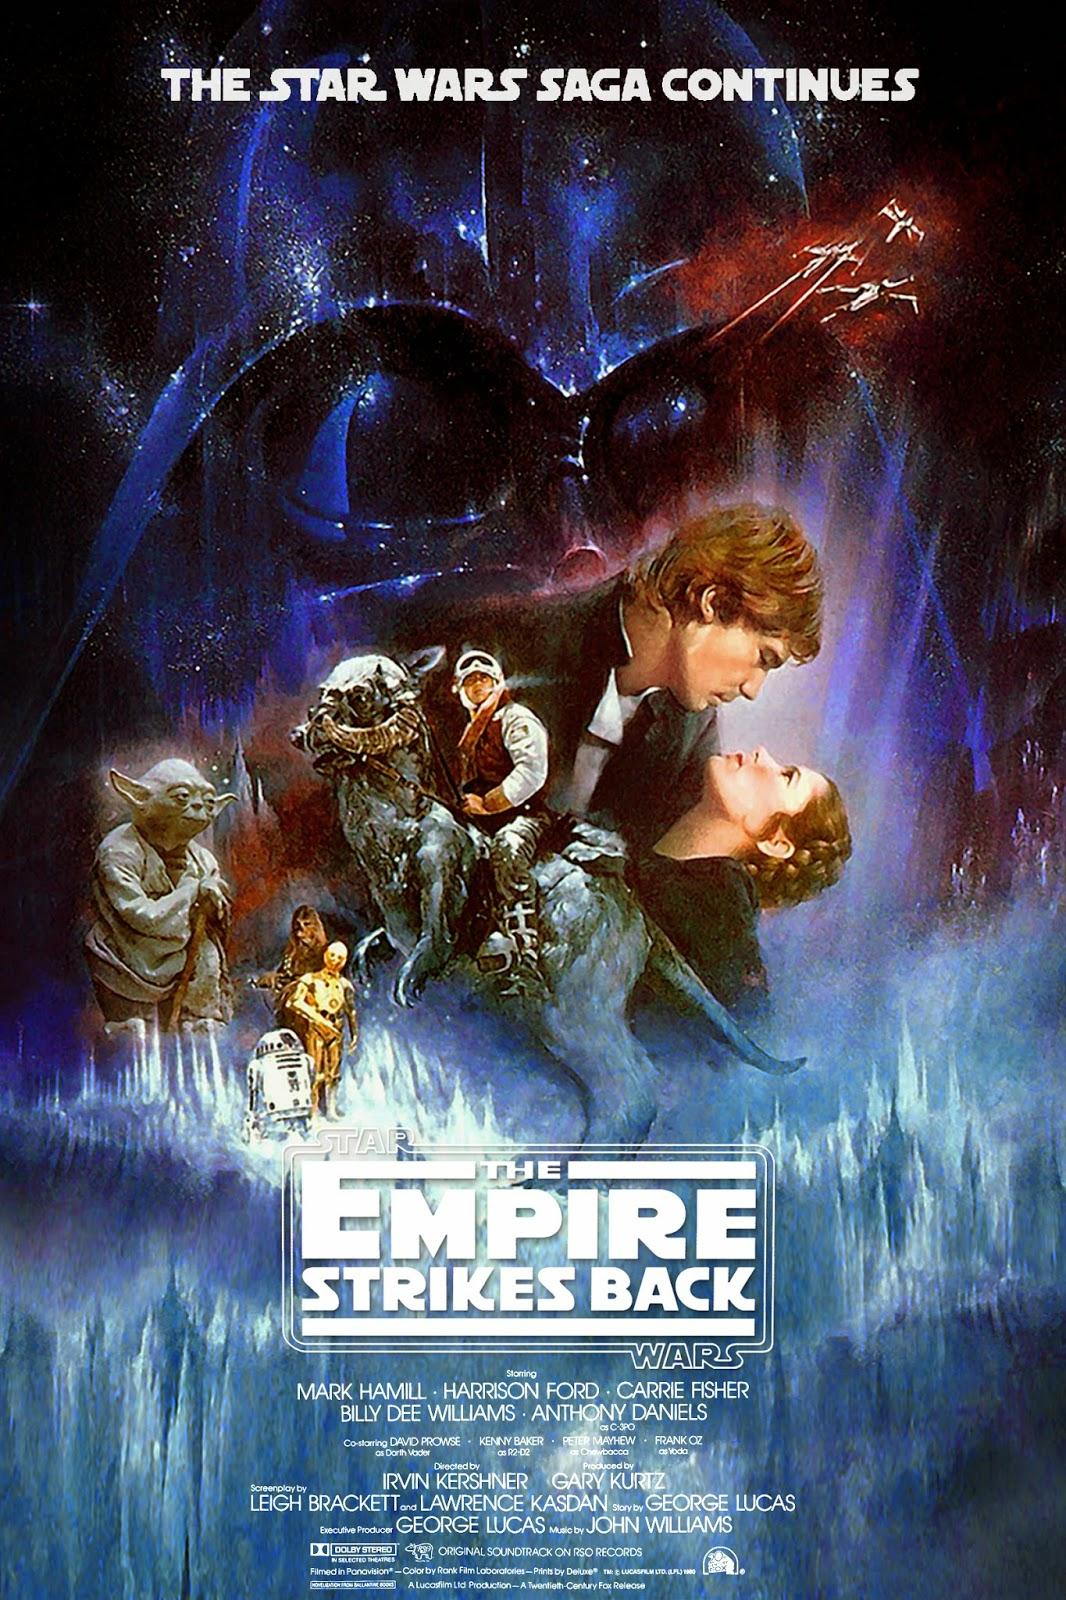 Star Wars Episode 5 The Empire Strikes Back สตาร์ วอร์ส เอพพิโซด 5: จักรวรรดิเอมไพร์โต้กลับ [HD][พากย์ไทย]